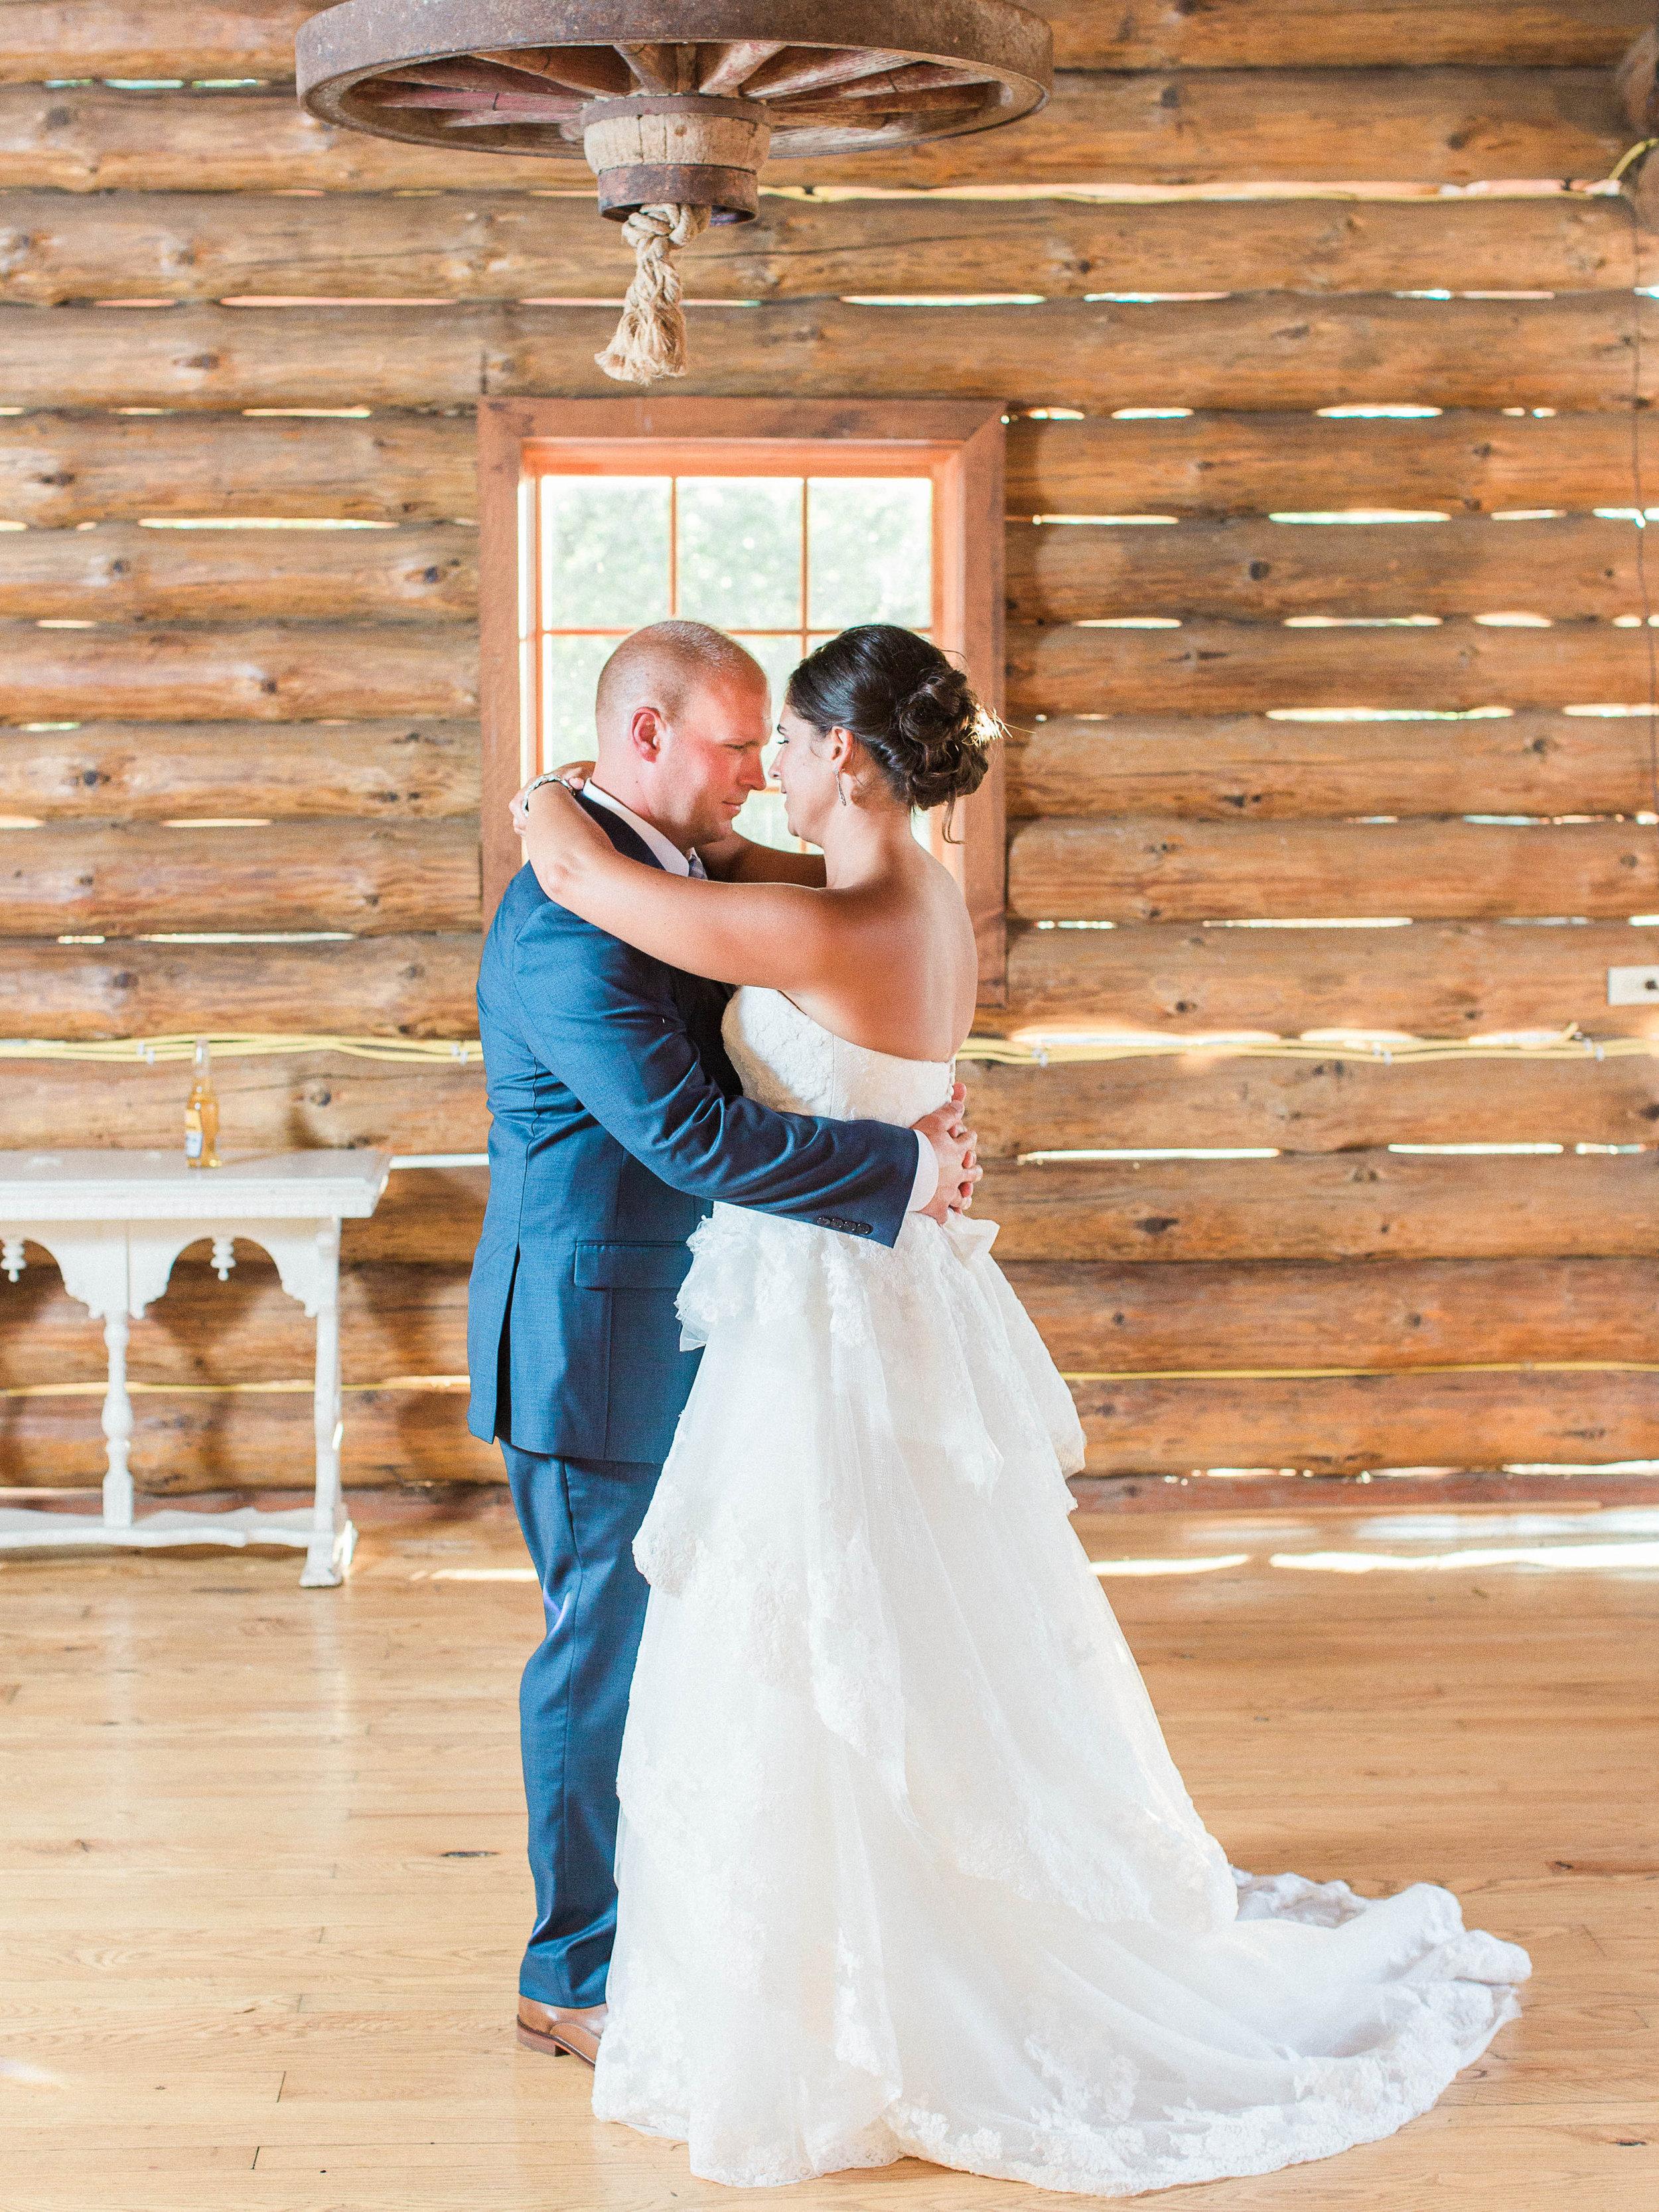 ERIC AND HALLIE WEDDING-HI RESOLUTION FOR PRINTING-1022.jpg